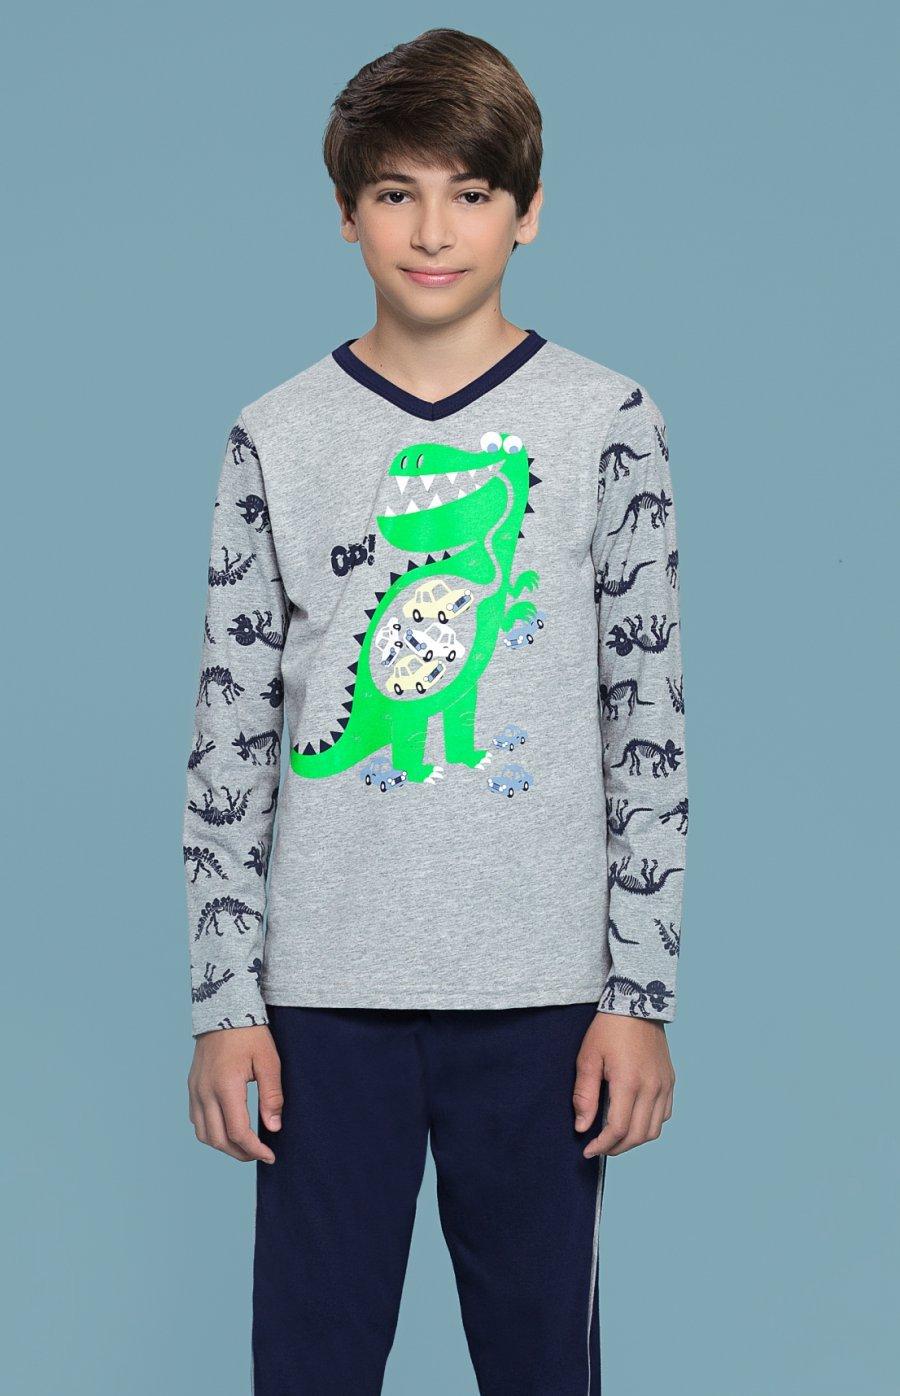 Pijama Infantil Dino PROMO Inverno 2018